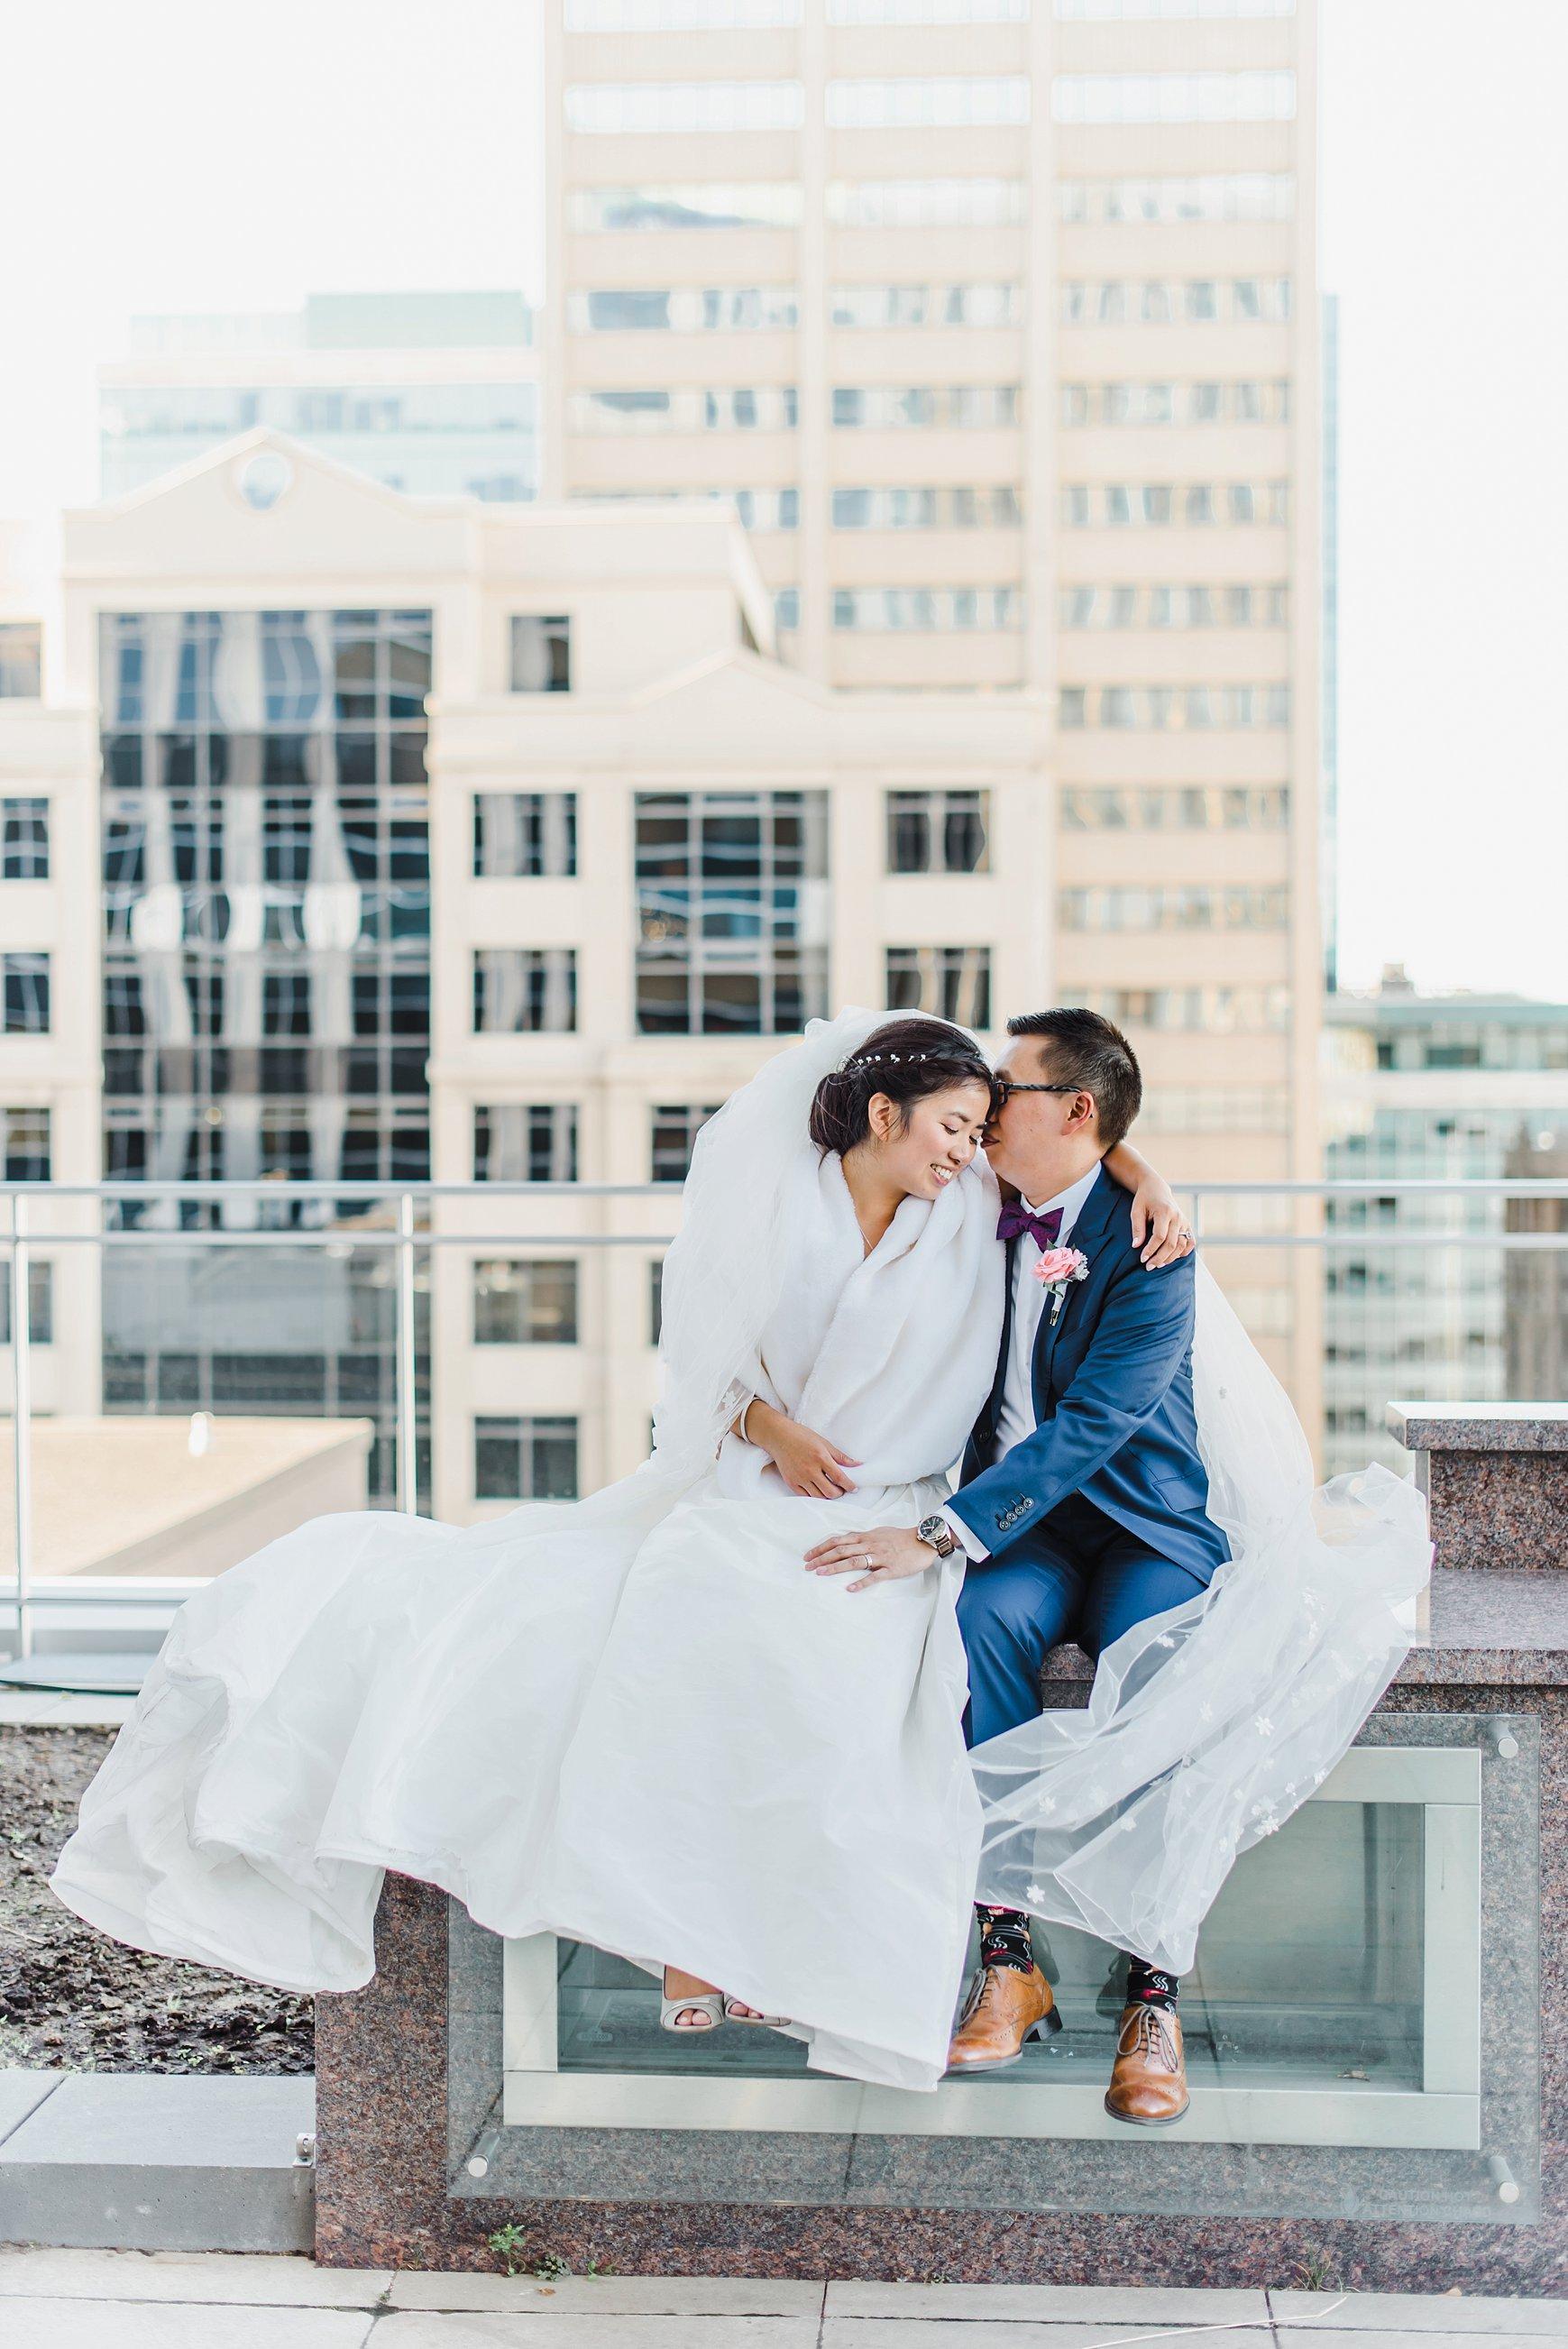 light airy indie fine art ottawa wedding photographer | Ali and Batoul Photography_1523.jpg